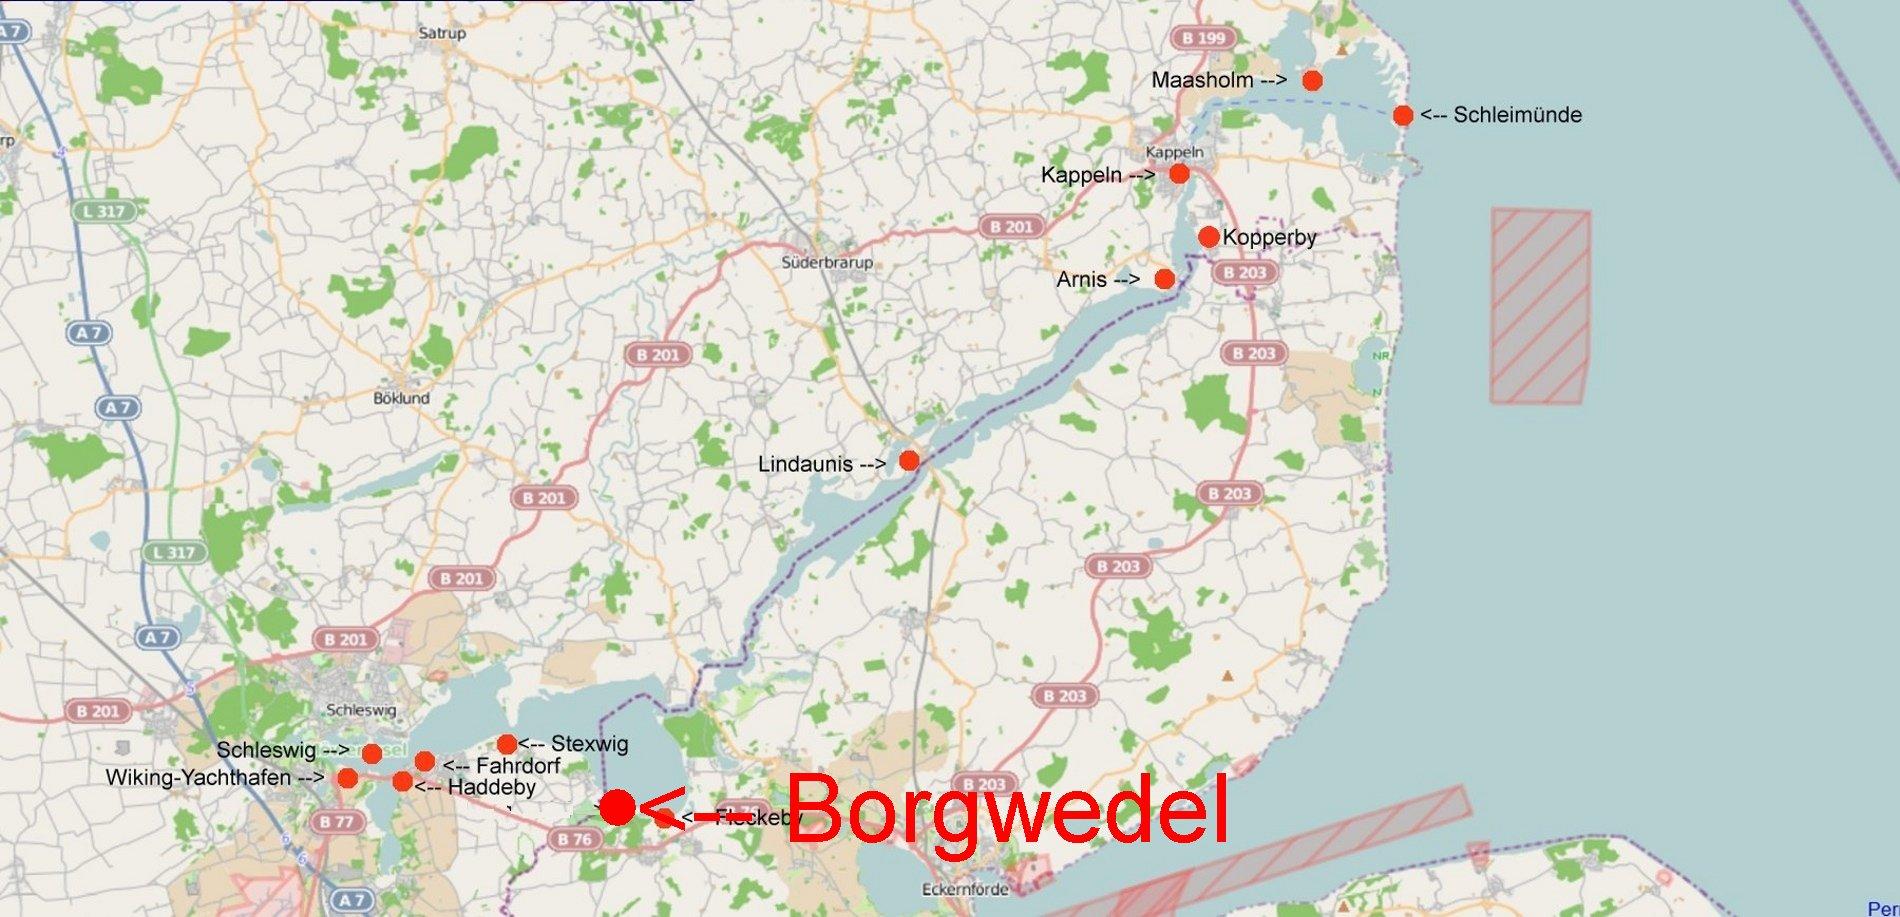 Borgwedel